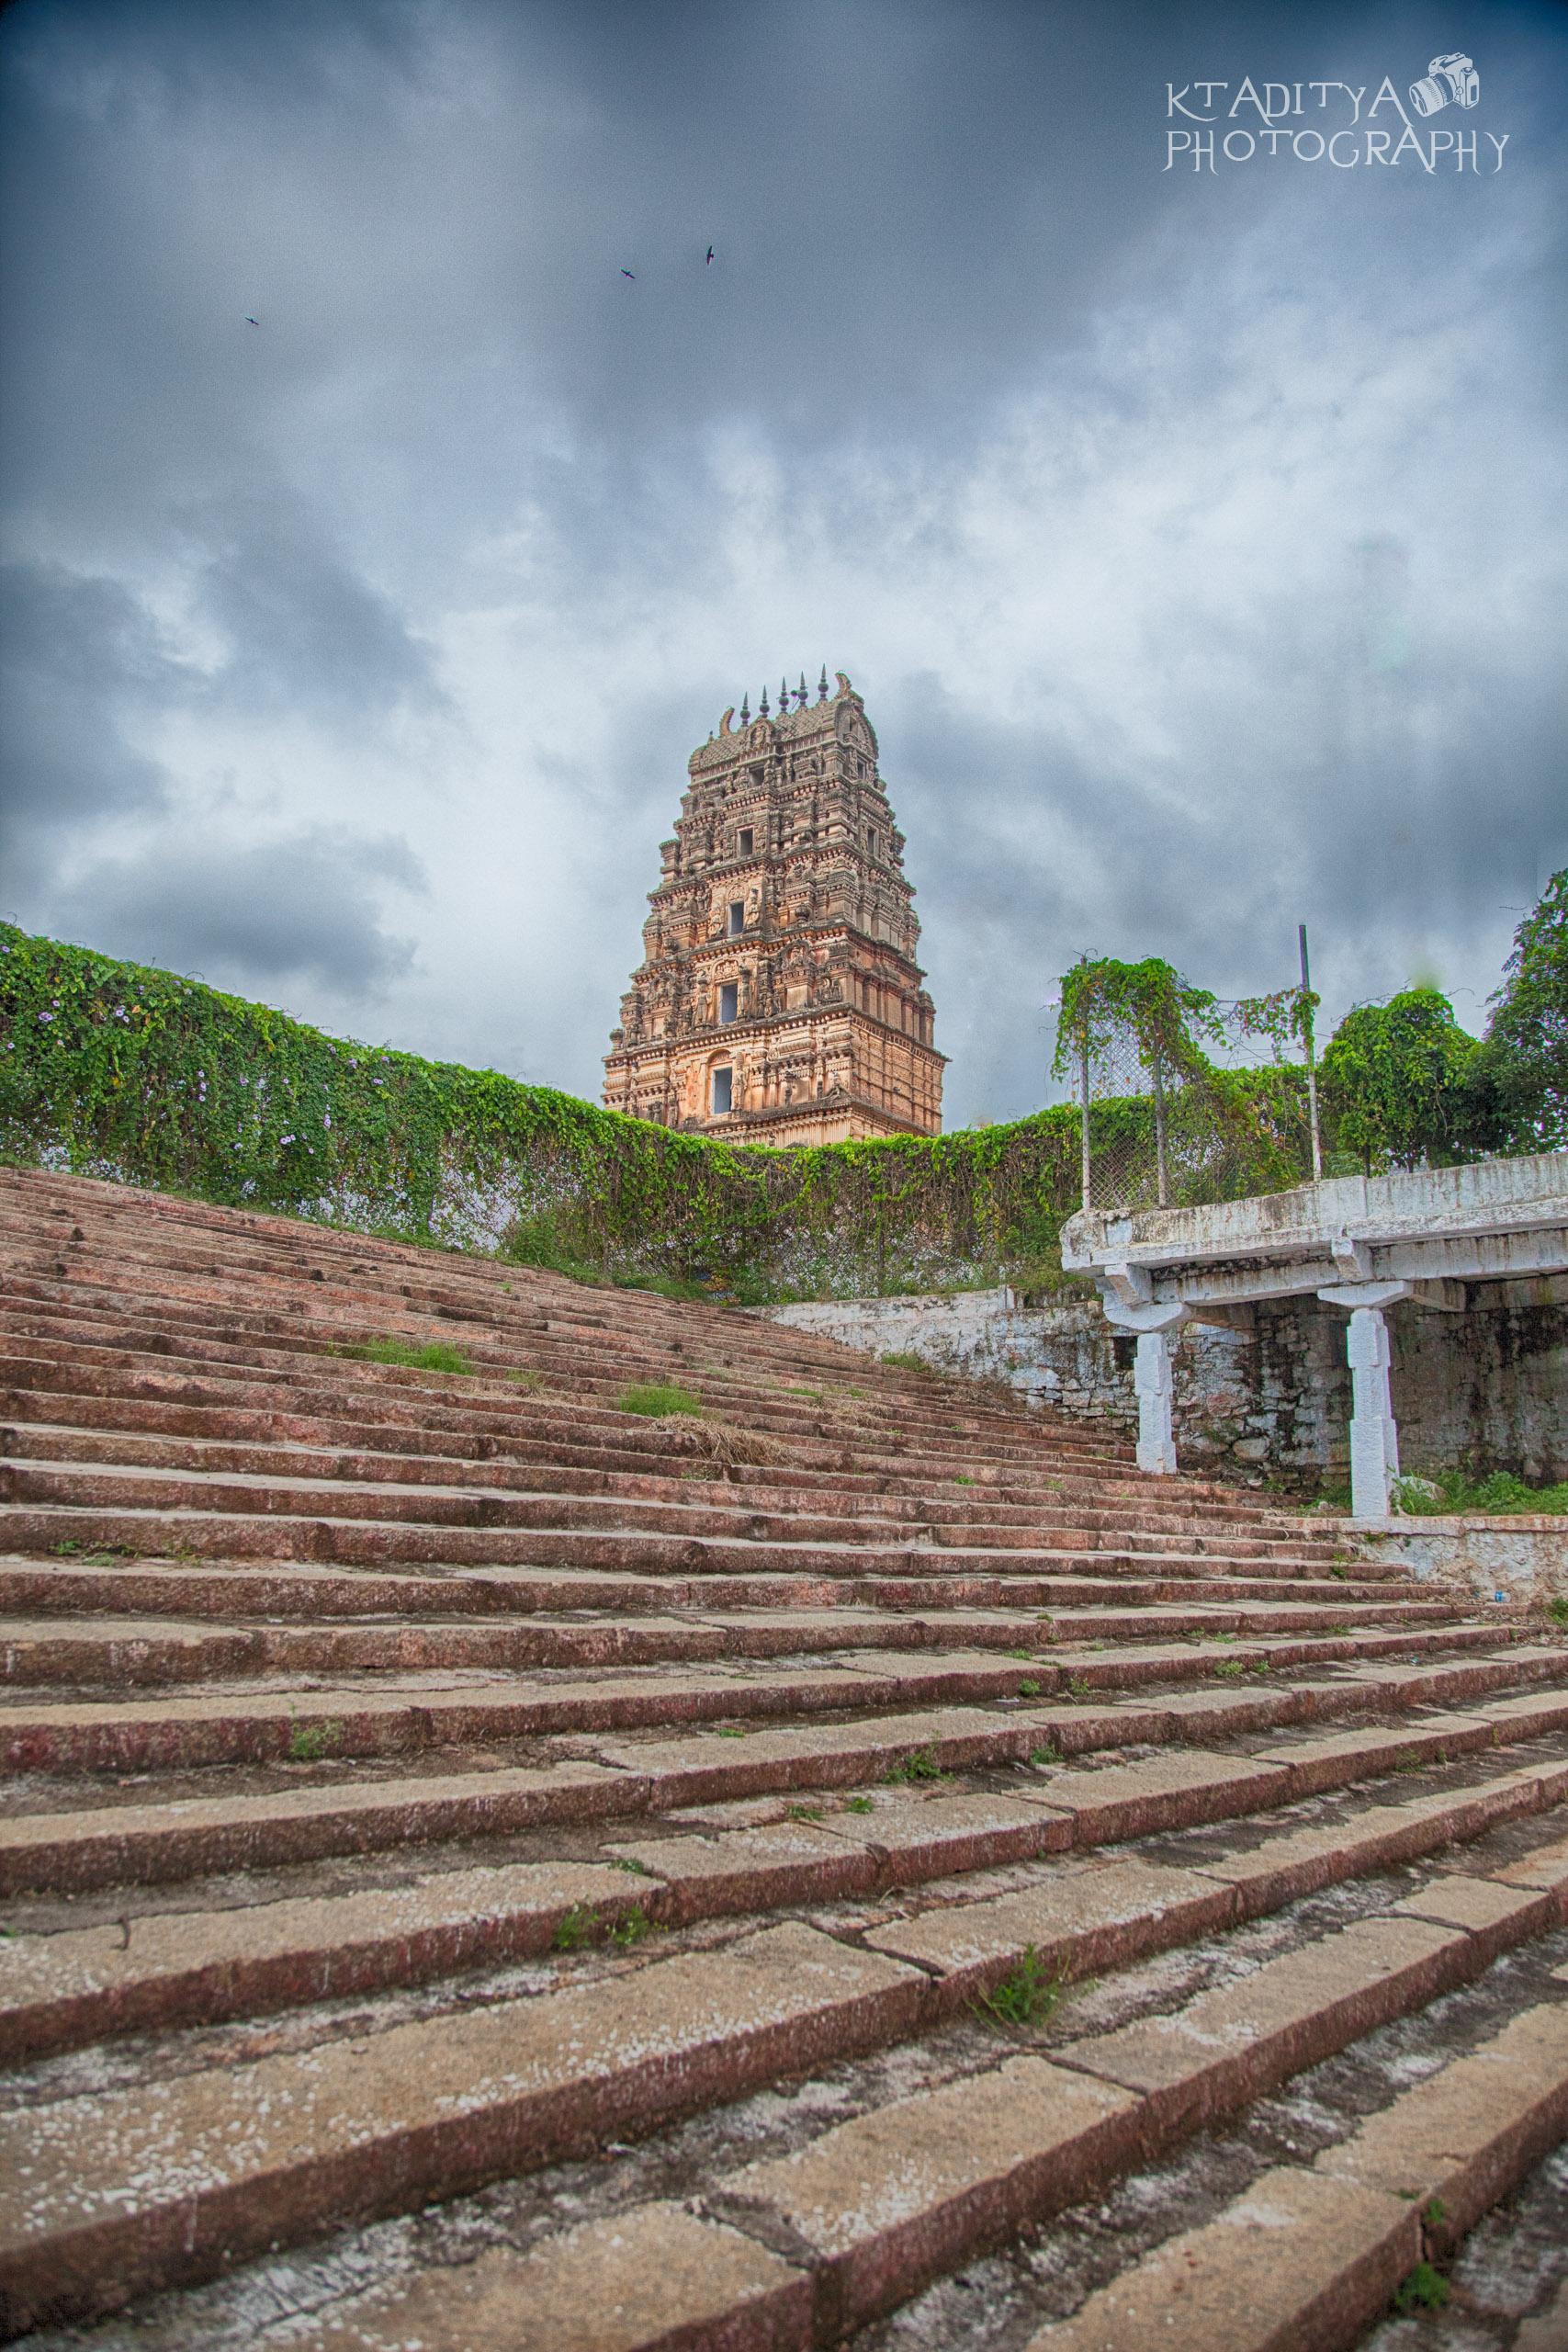 Koodanda Raamachandra temple